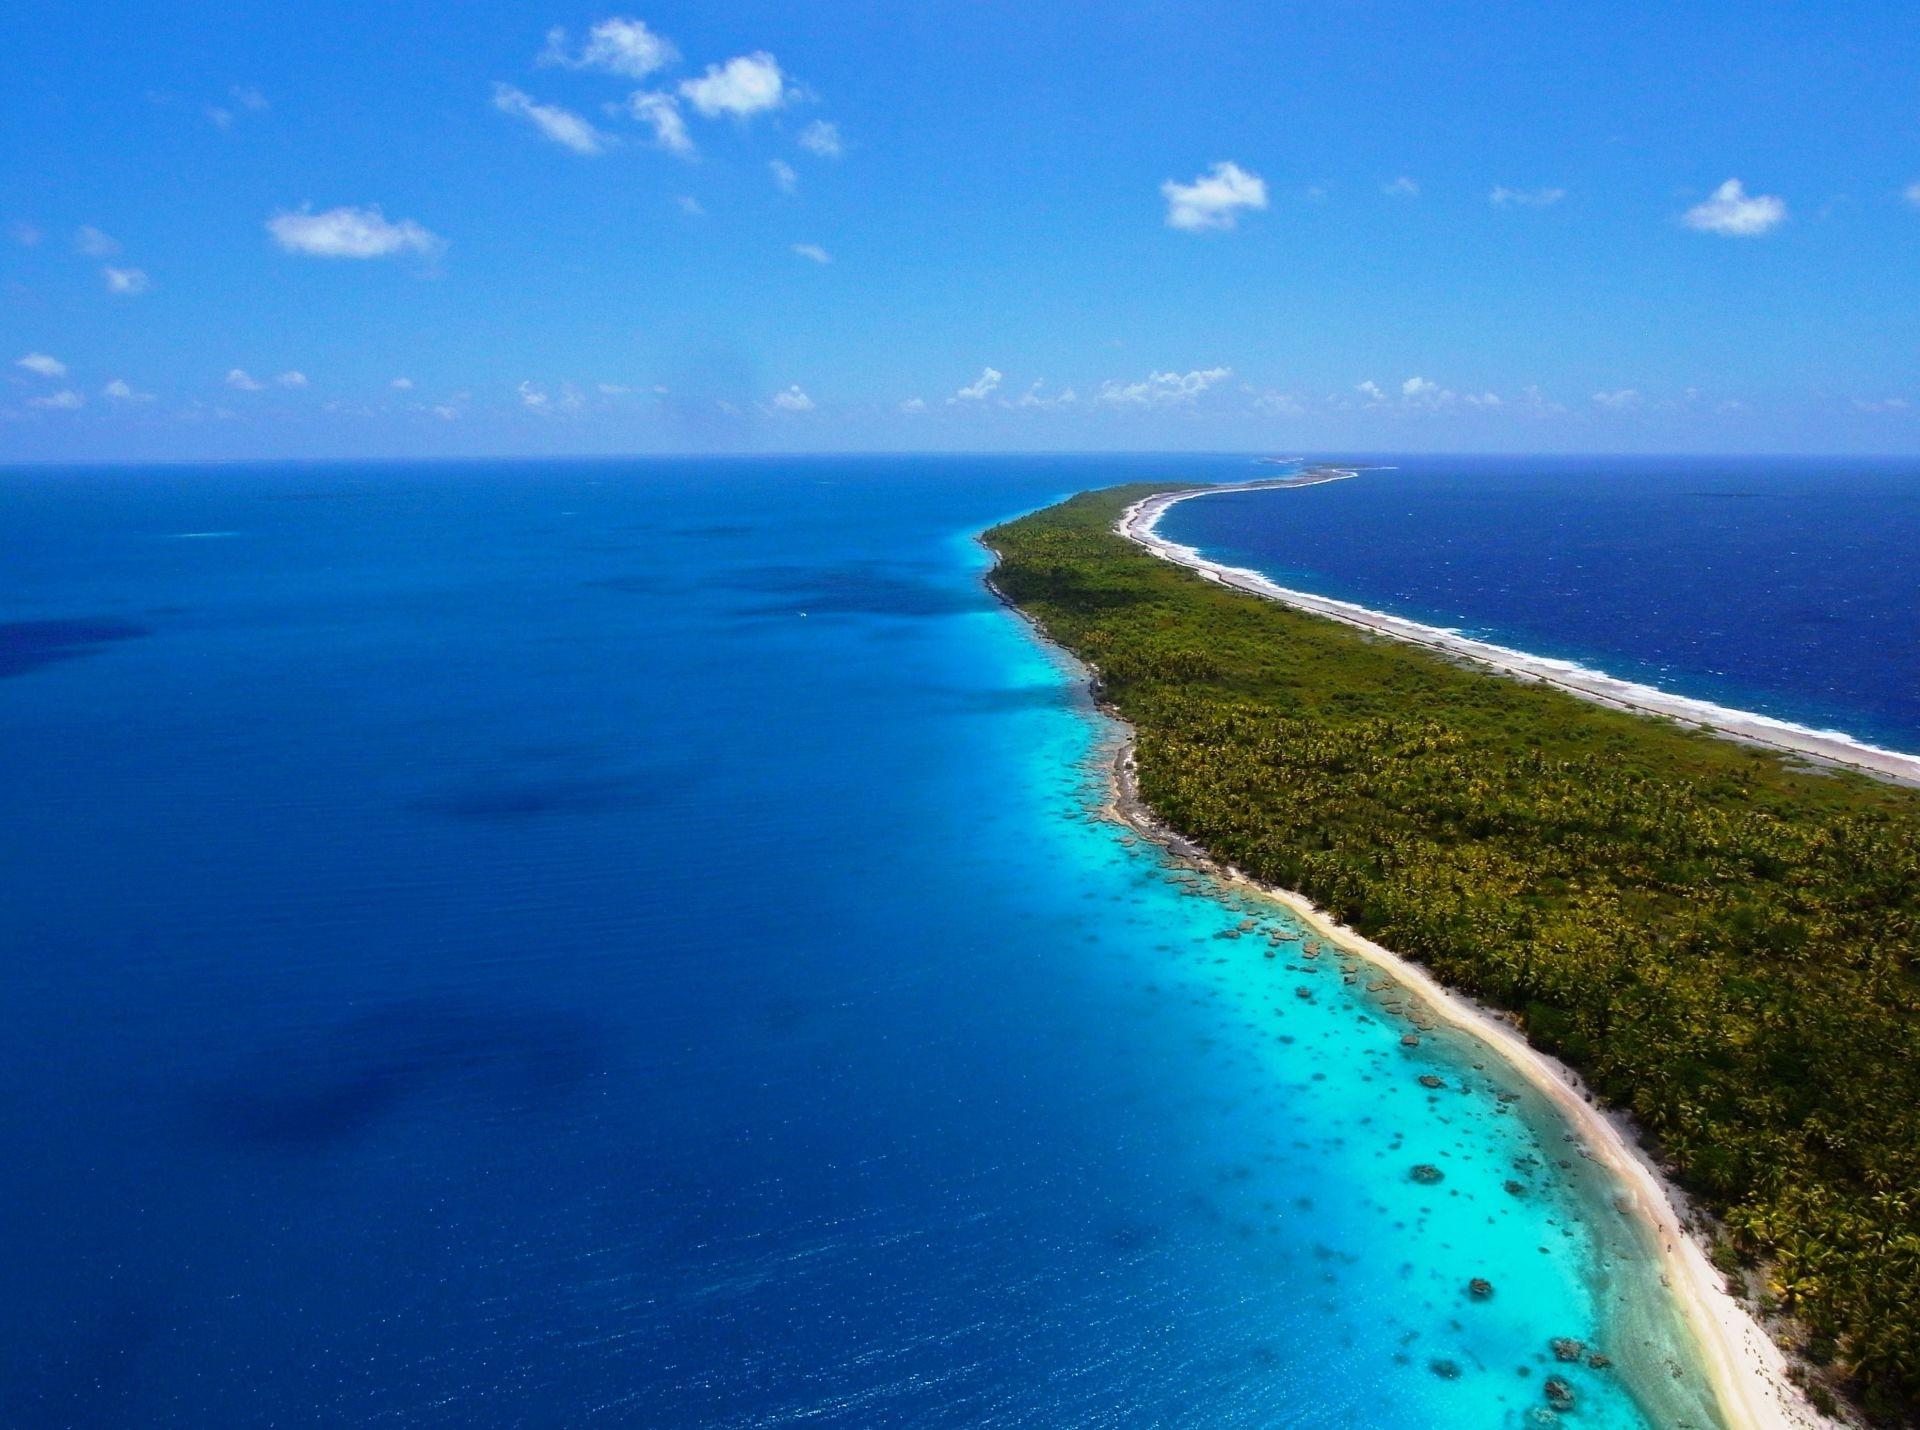 Океан остров природа пейзаж море